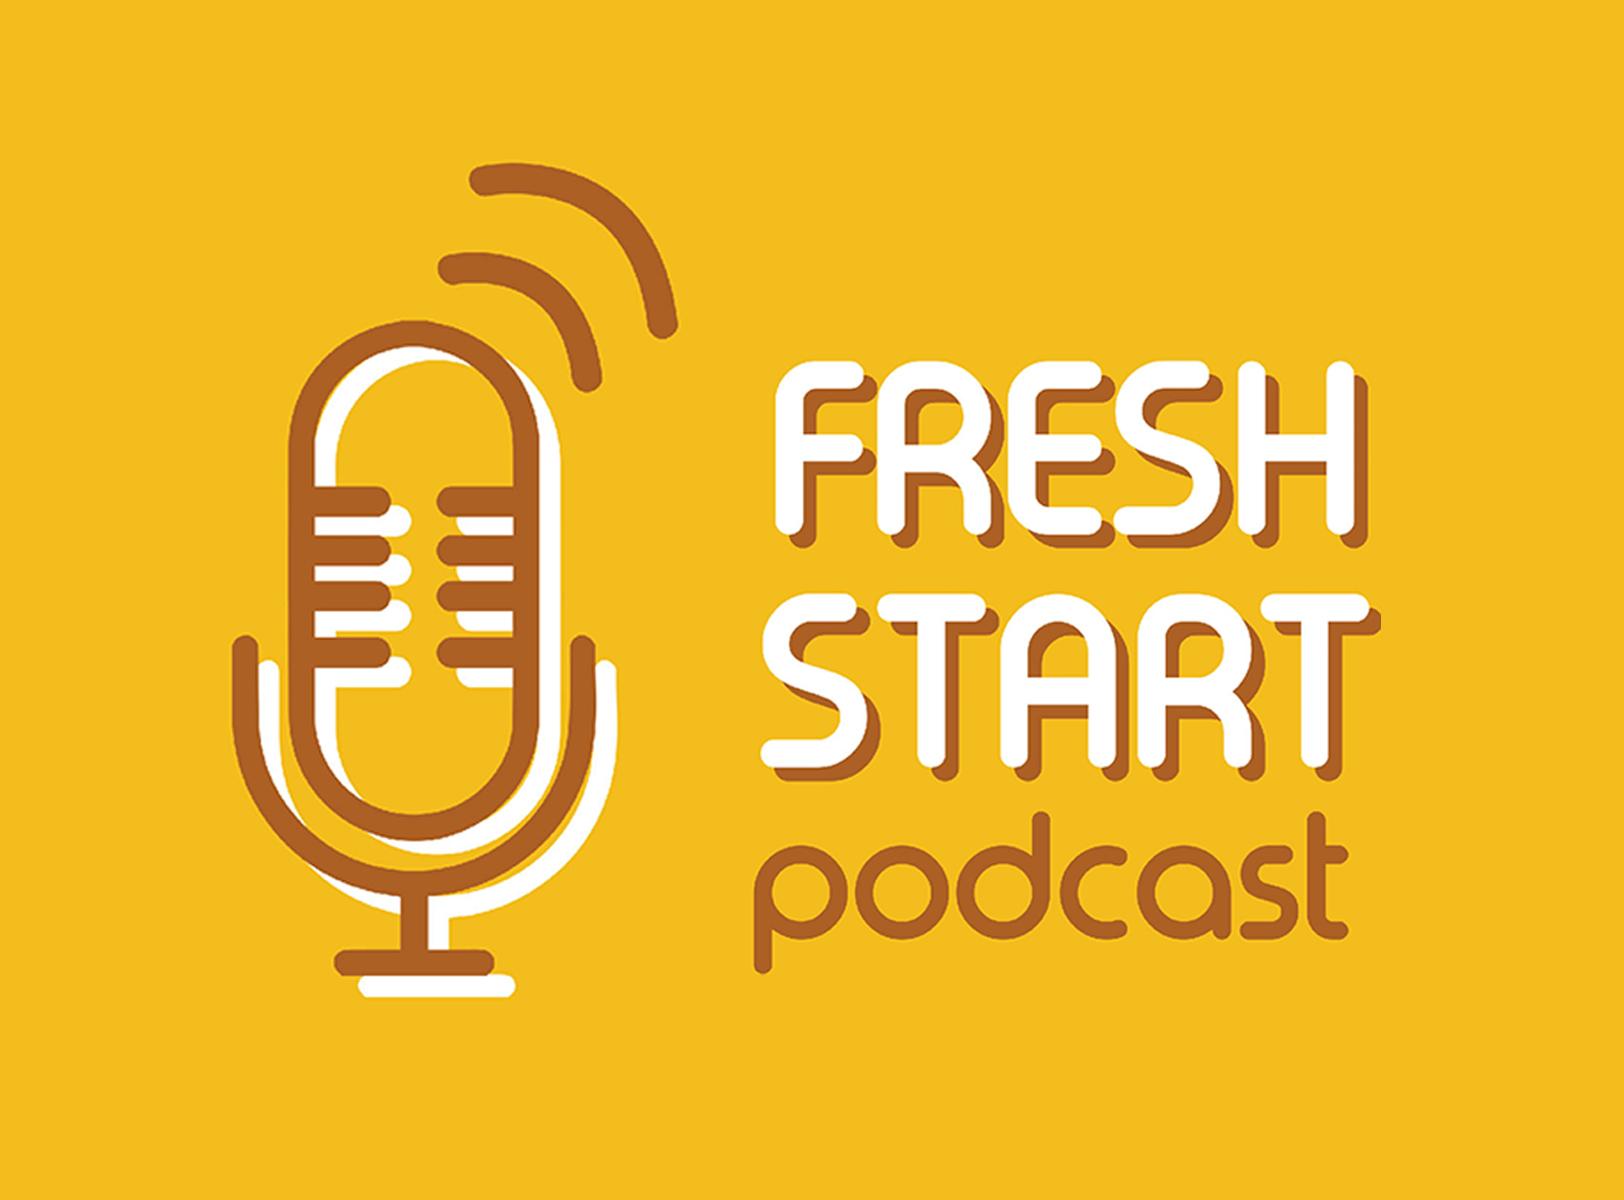 Fresh Start: Podcast News (10/9/2019 Wed.)